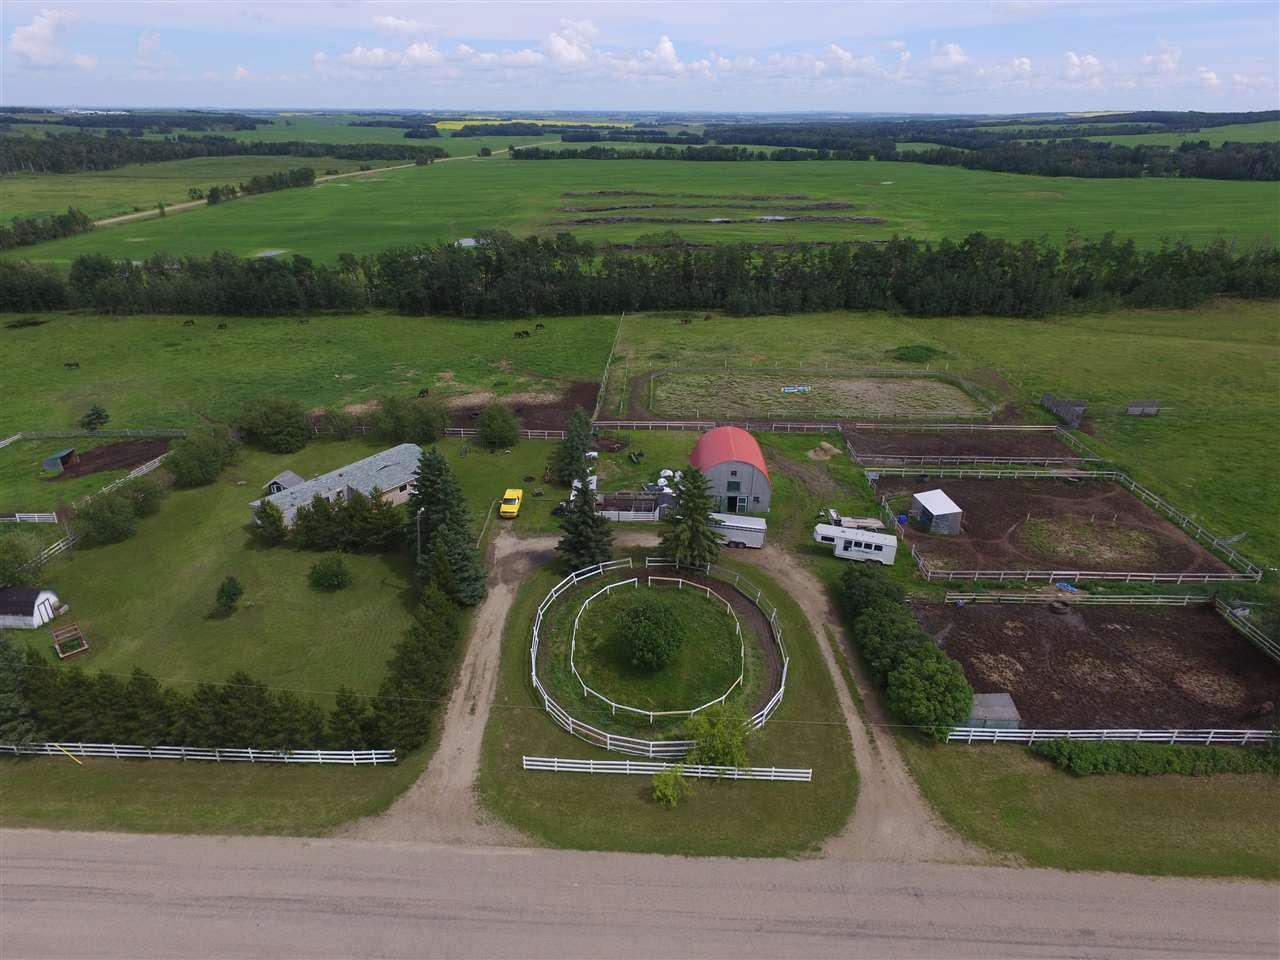 Main Photo: 423069 Rge Rd 10: Rural Ponoka County Manufactured Home for sale : MLS®# E4206175